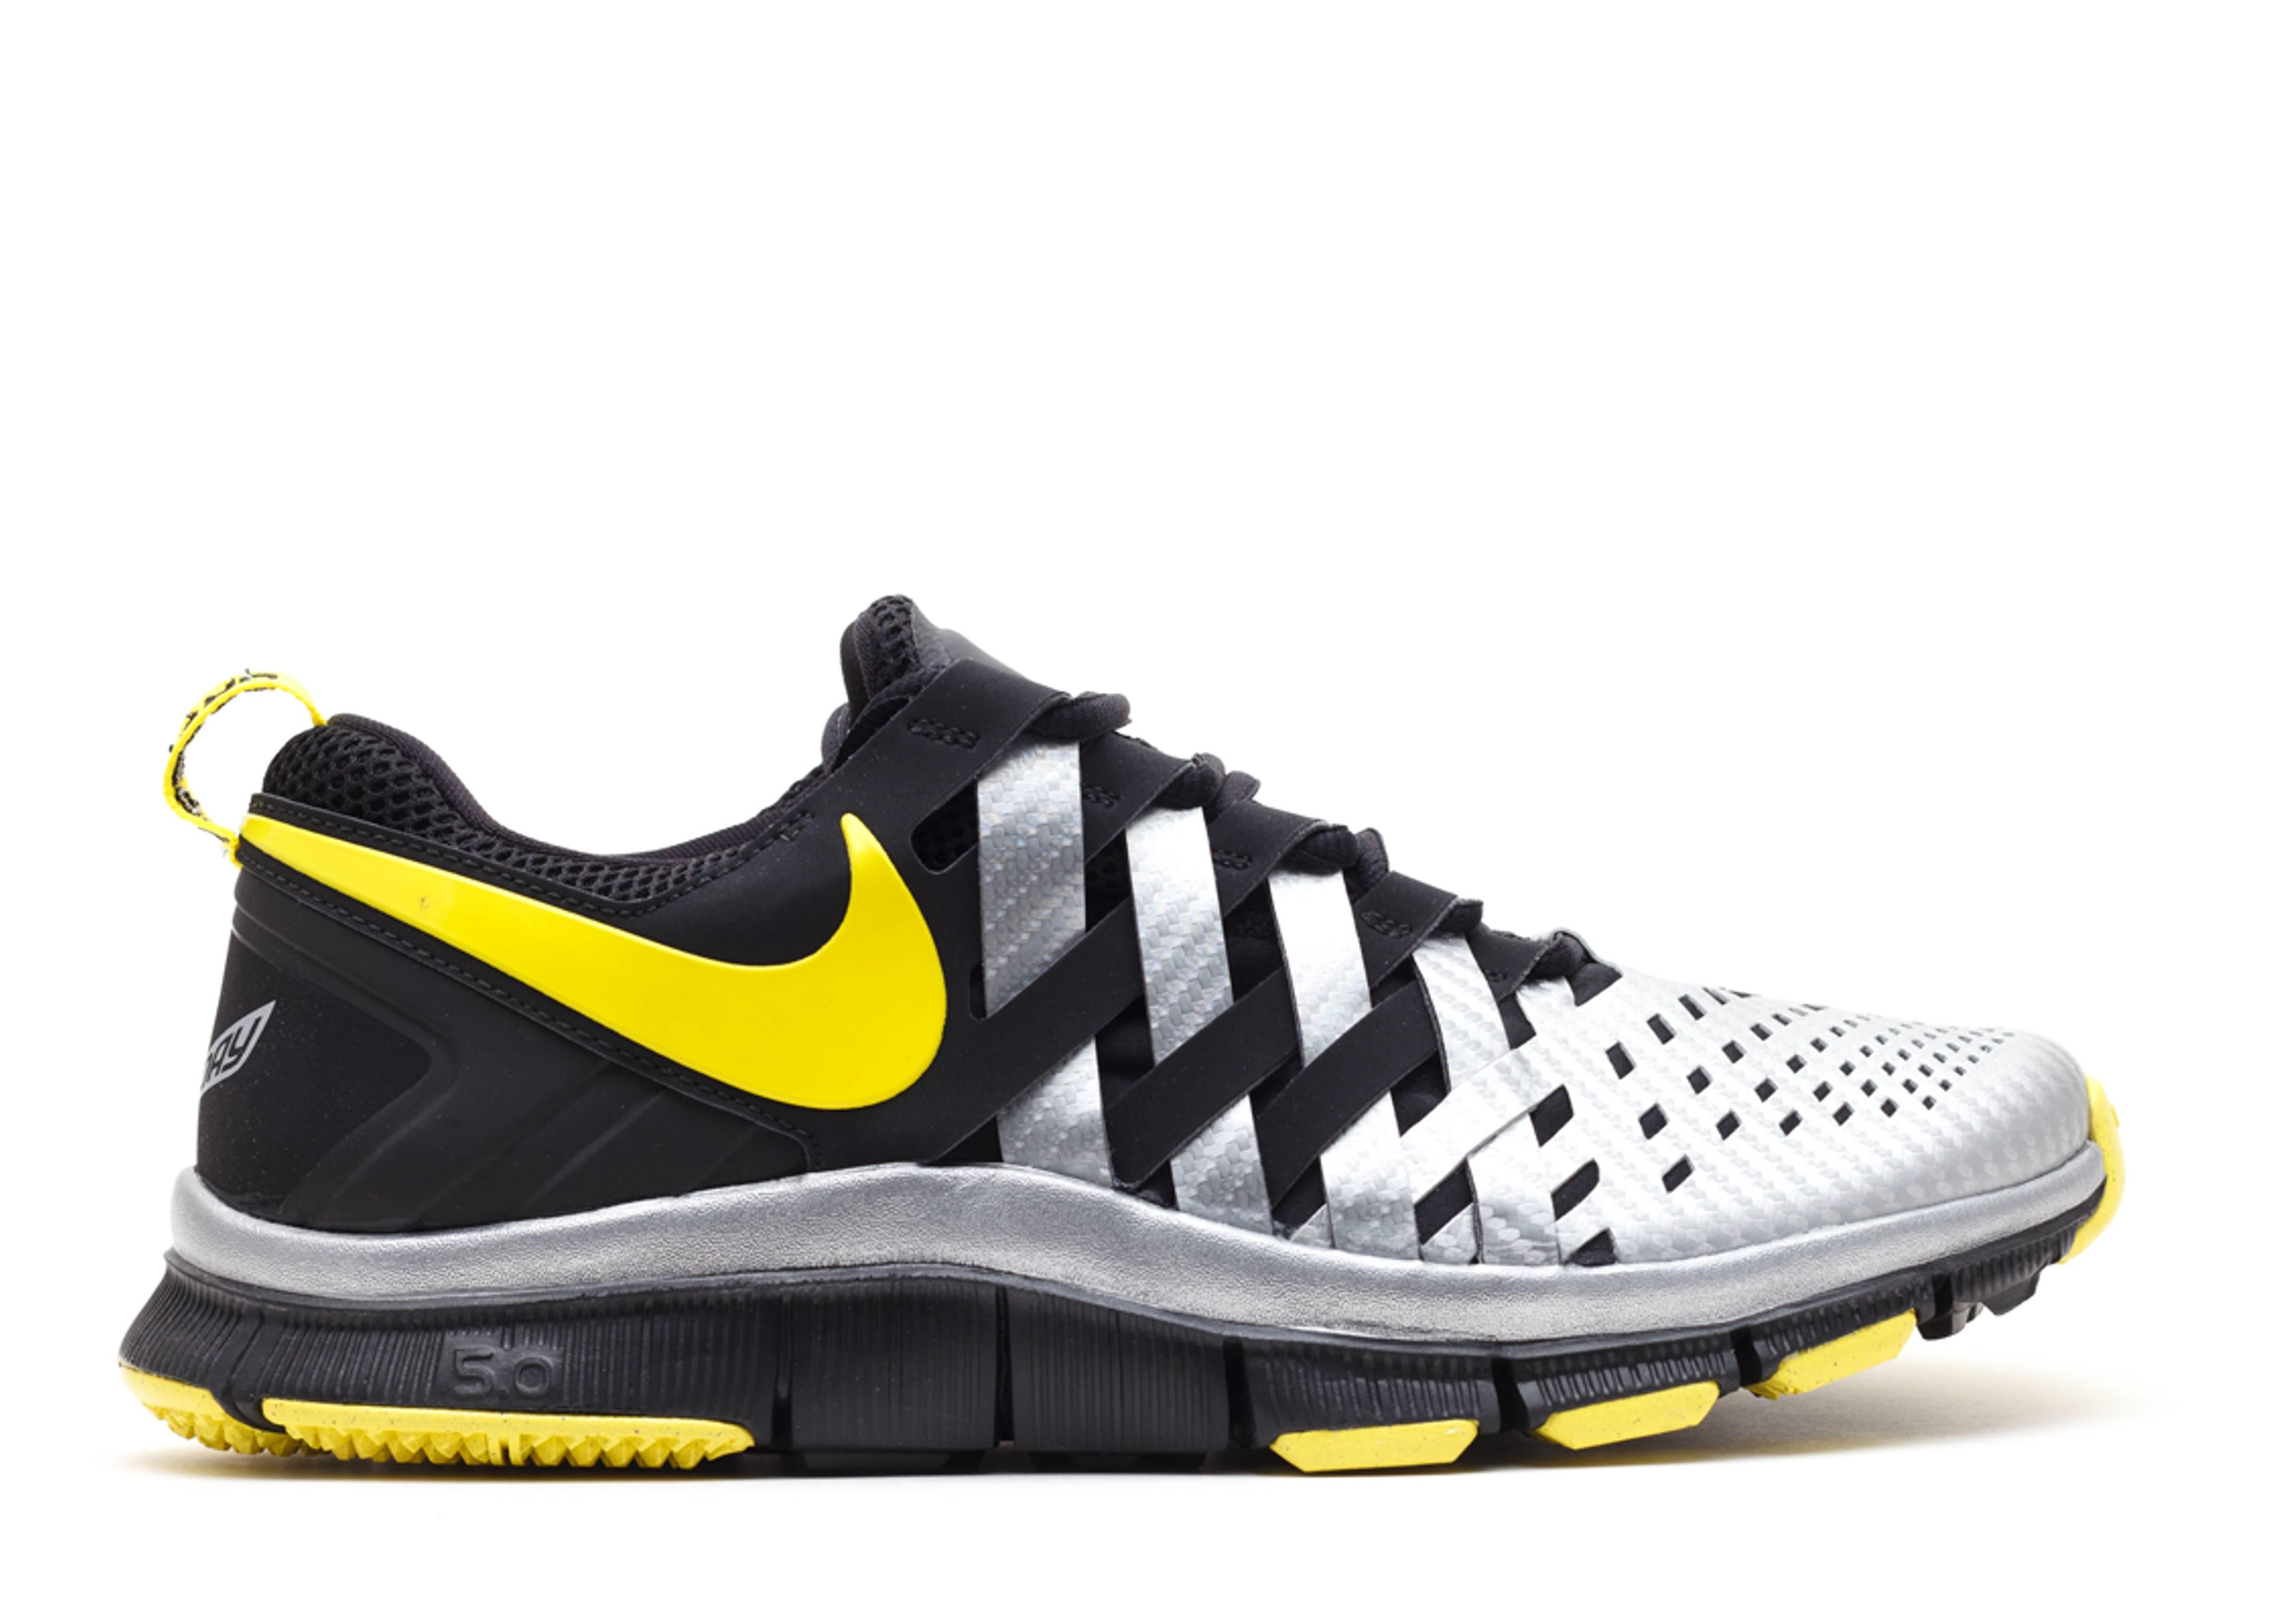 huge discount b64ec 91d01 free trnr 5.0 nrg rivalry Nike Free Trainer 5.0 Reflective Black ...